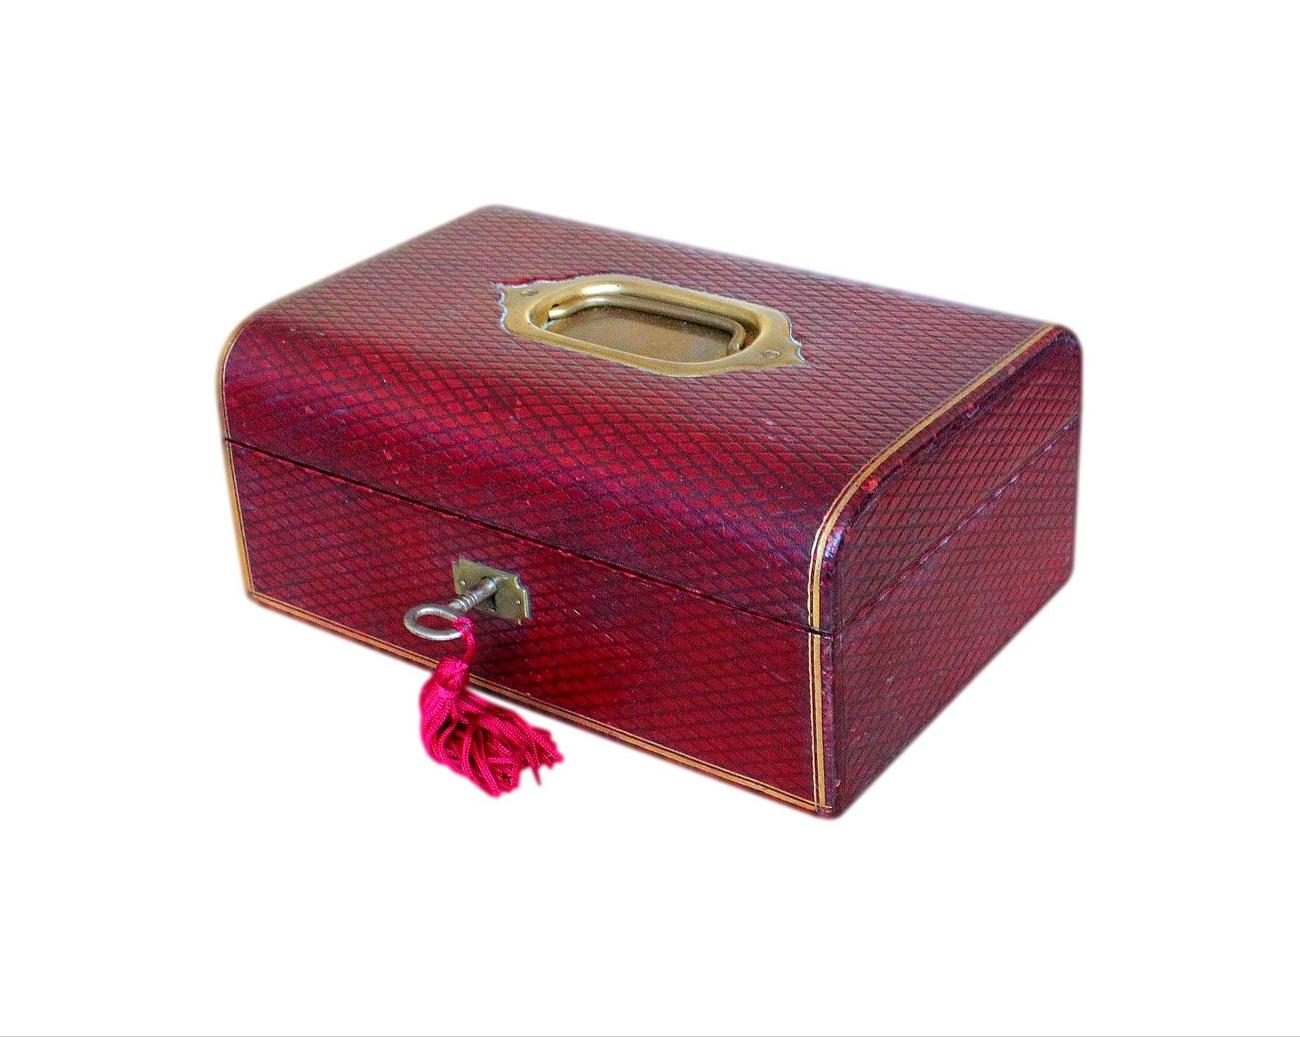 Victorian_Burgundy_Leather_Jewellery_Box.jpg